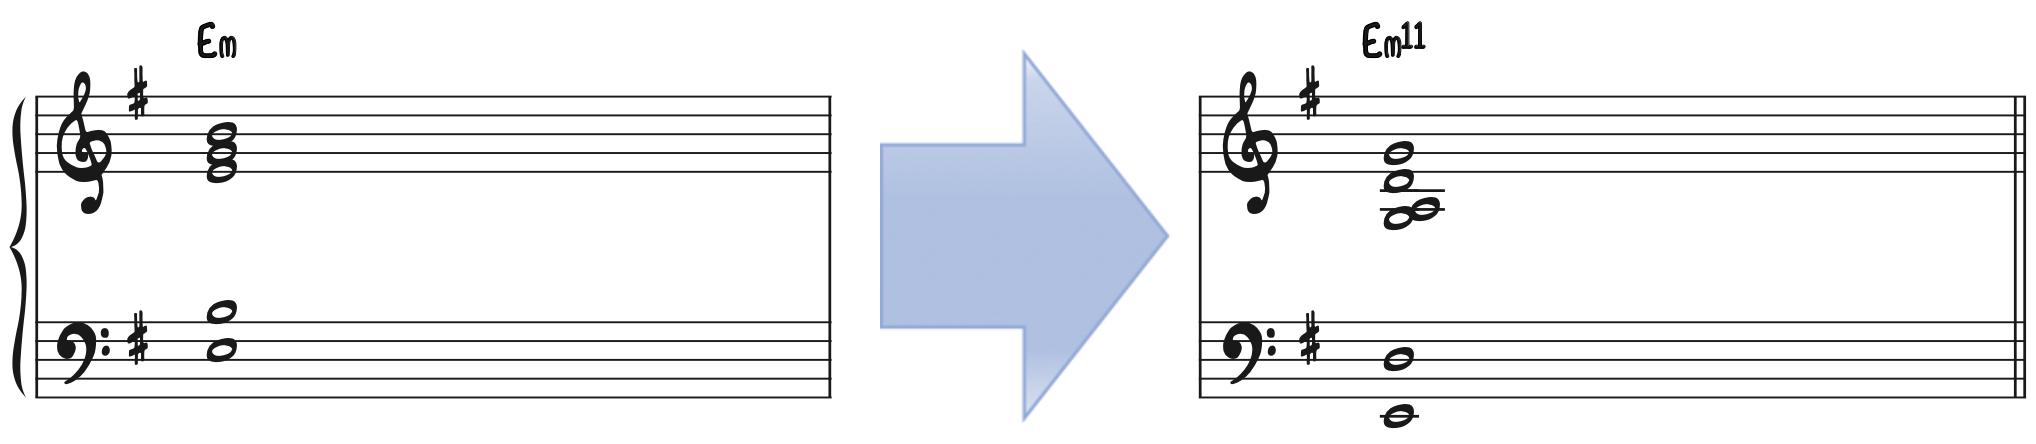 Jazzy E Minor 11 Chord Voicing Em11